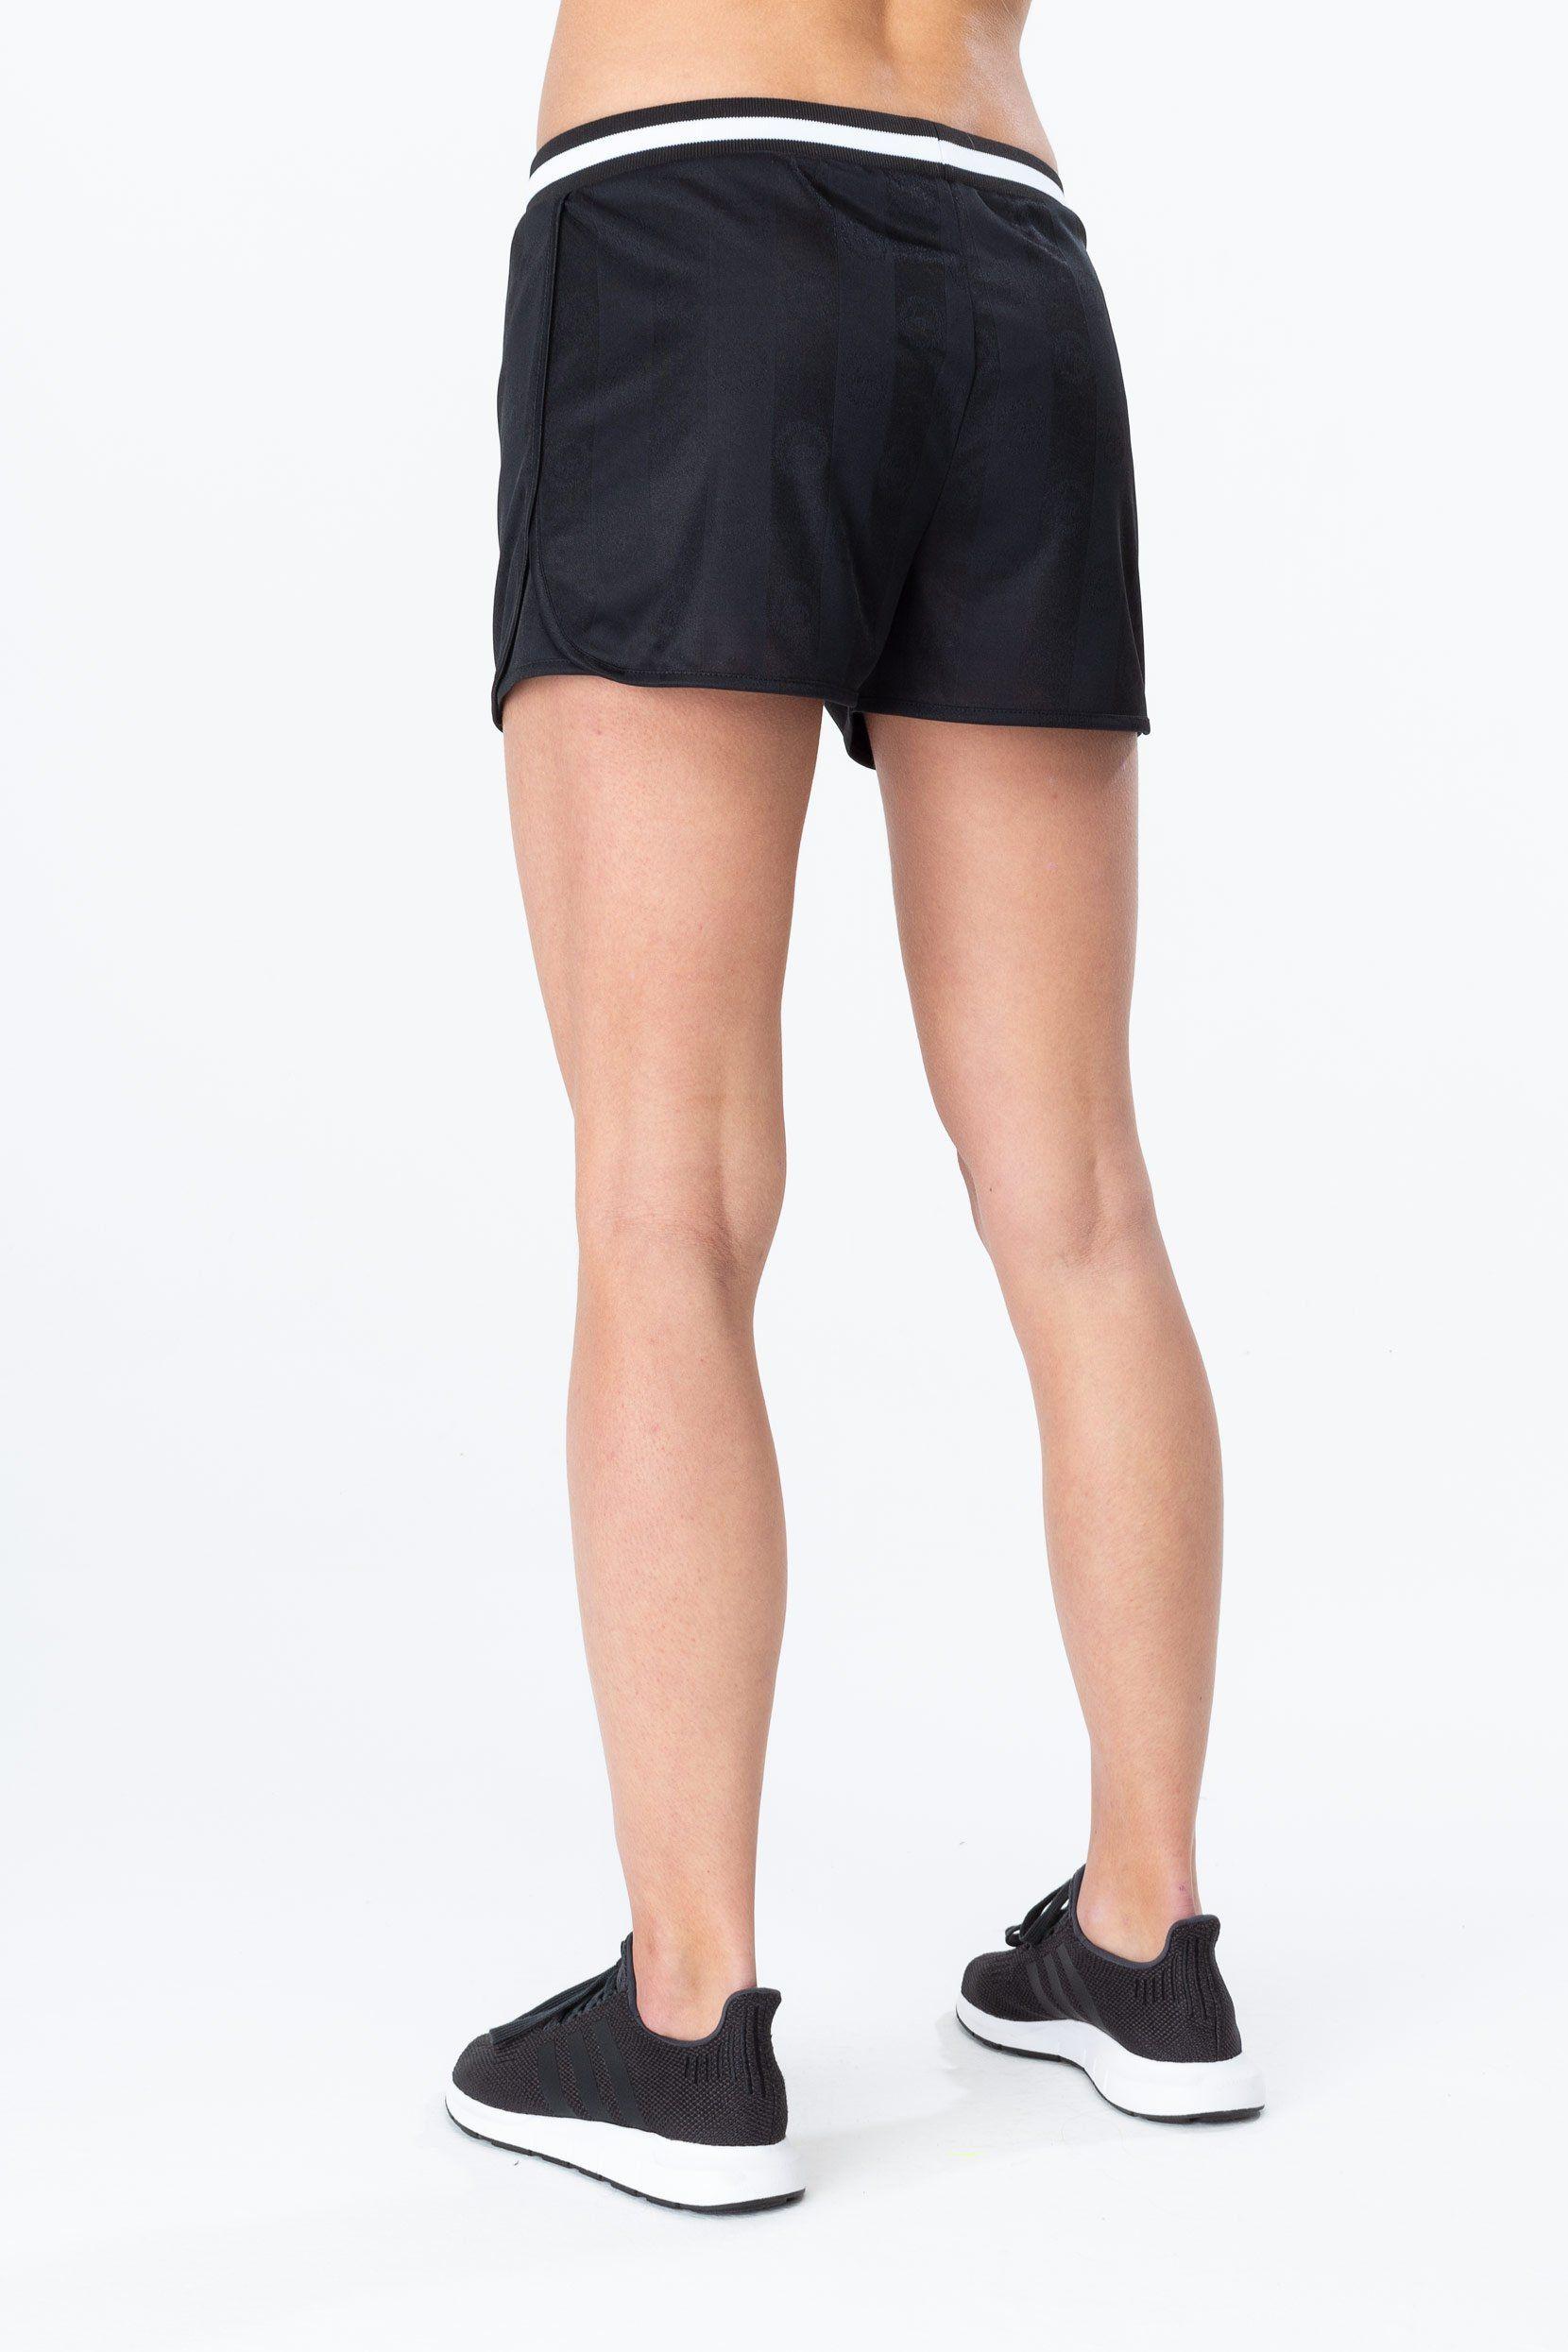 Hype Black Retro Sport Womens Running Shorts